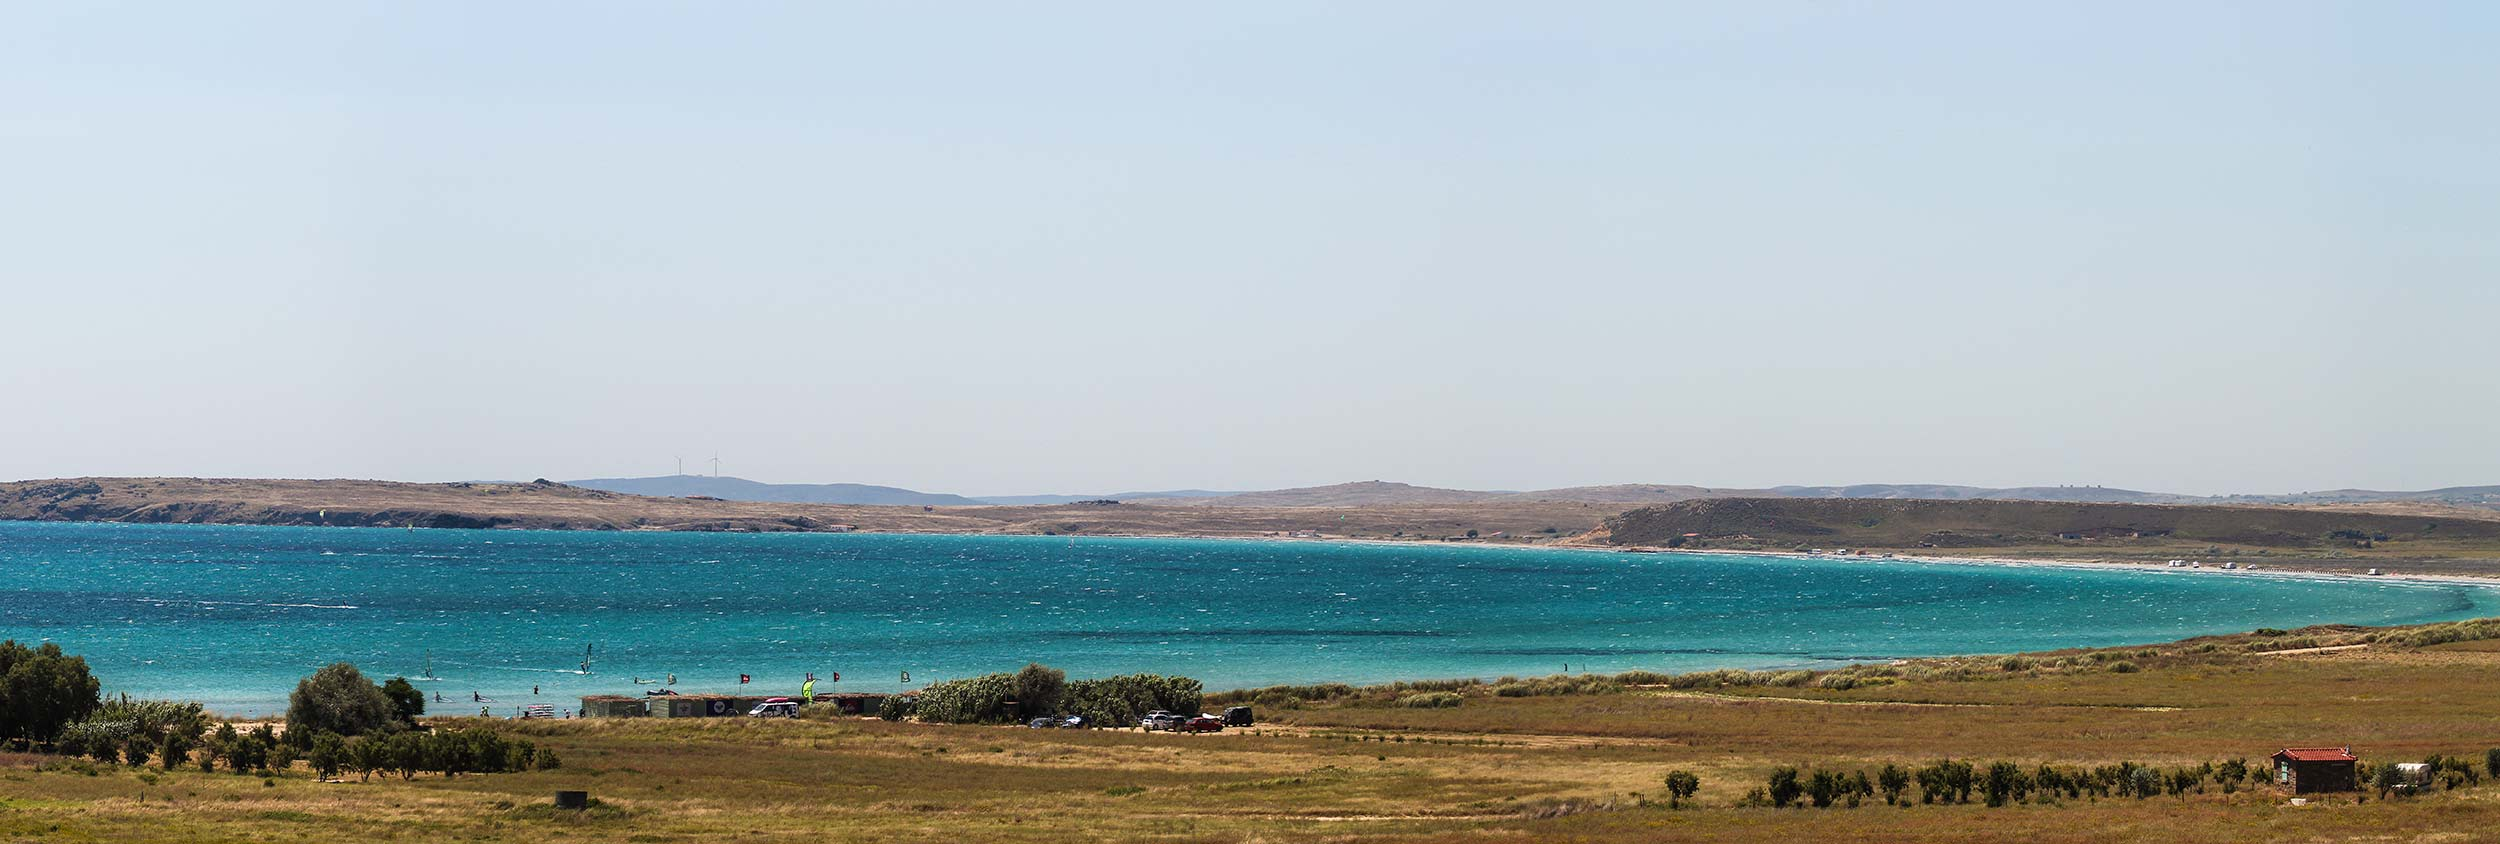 limnos-greece-kitespot